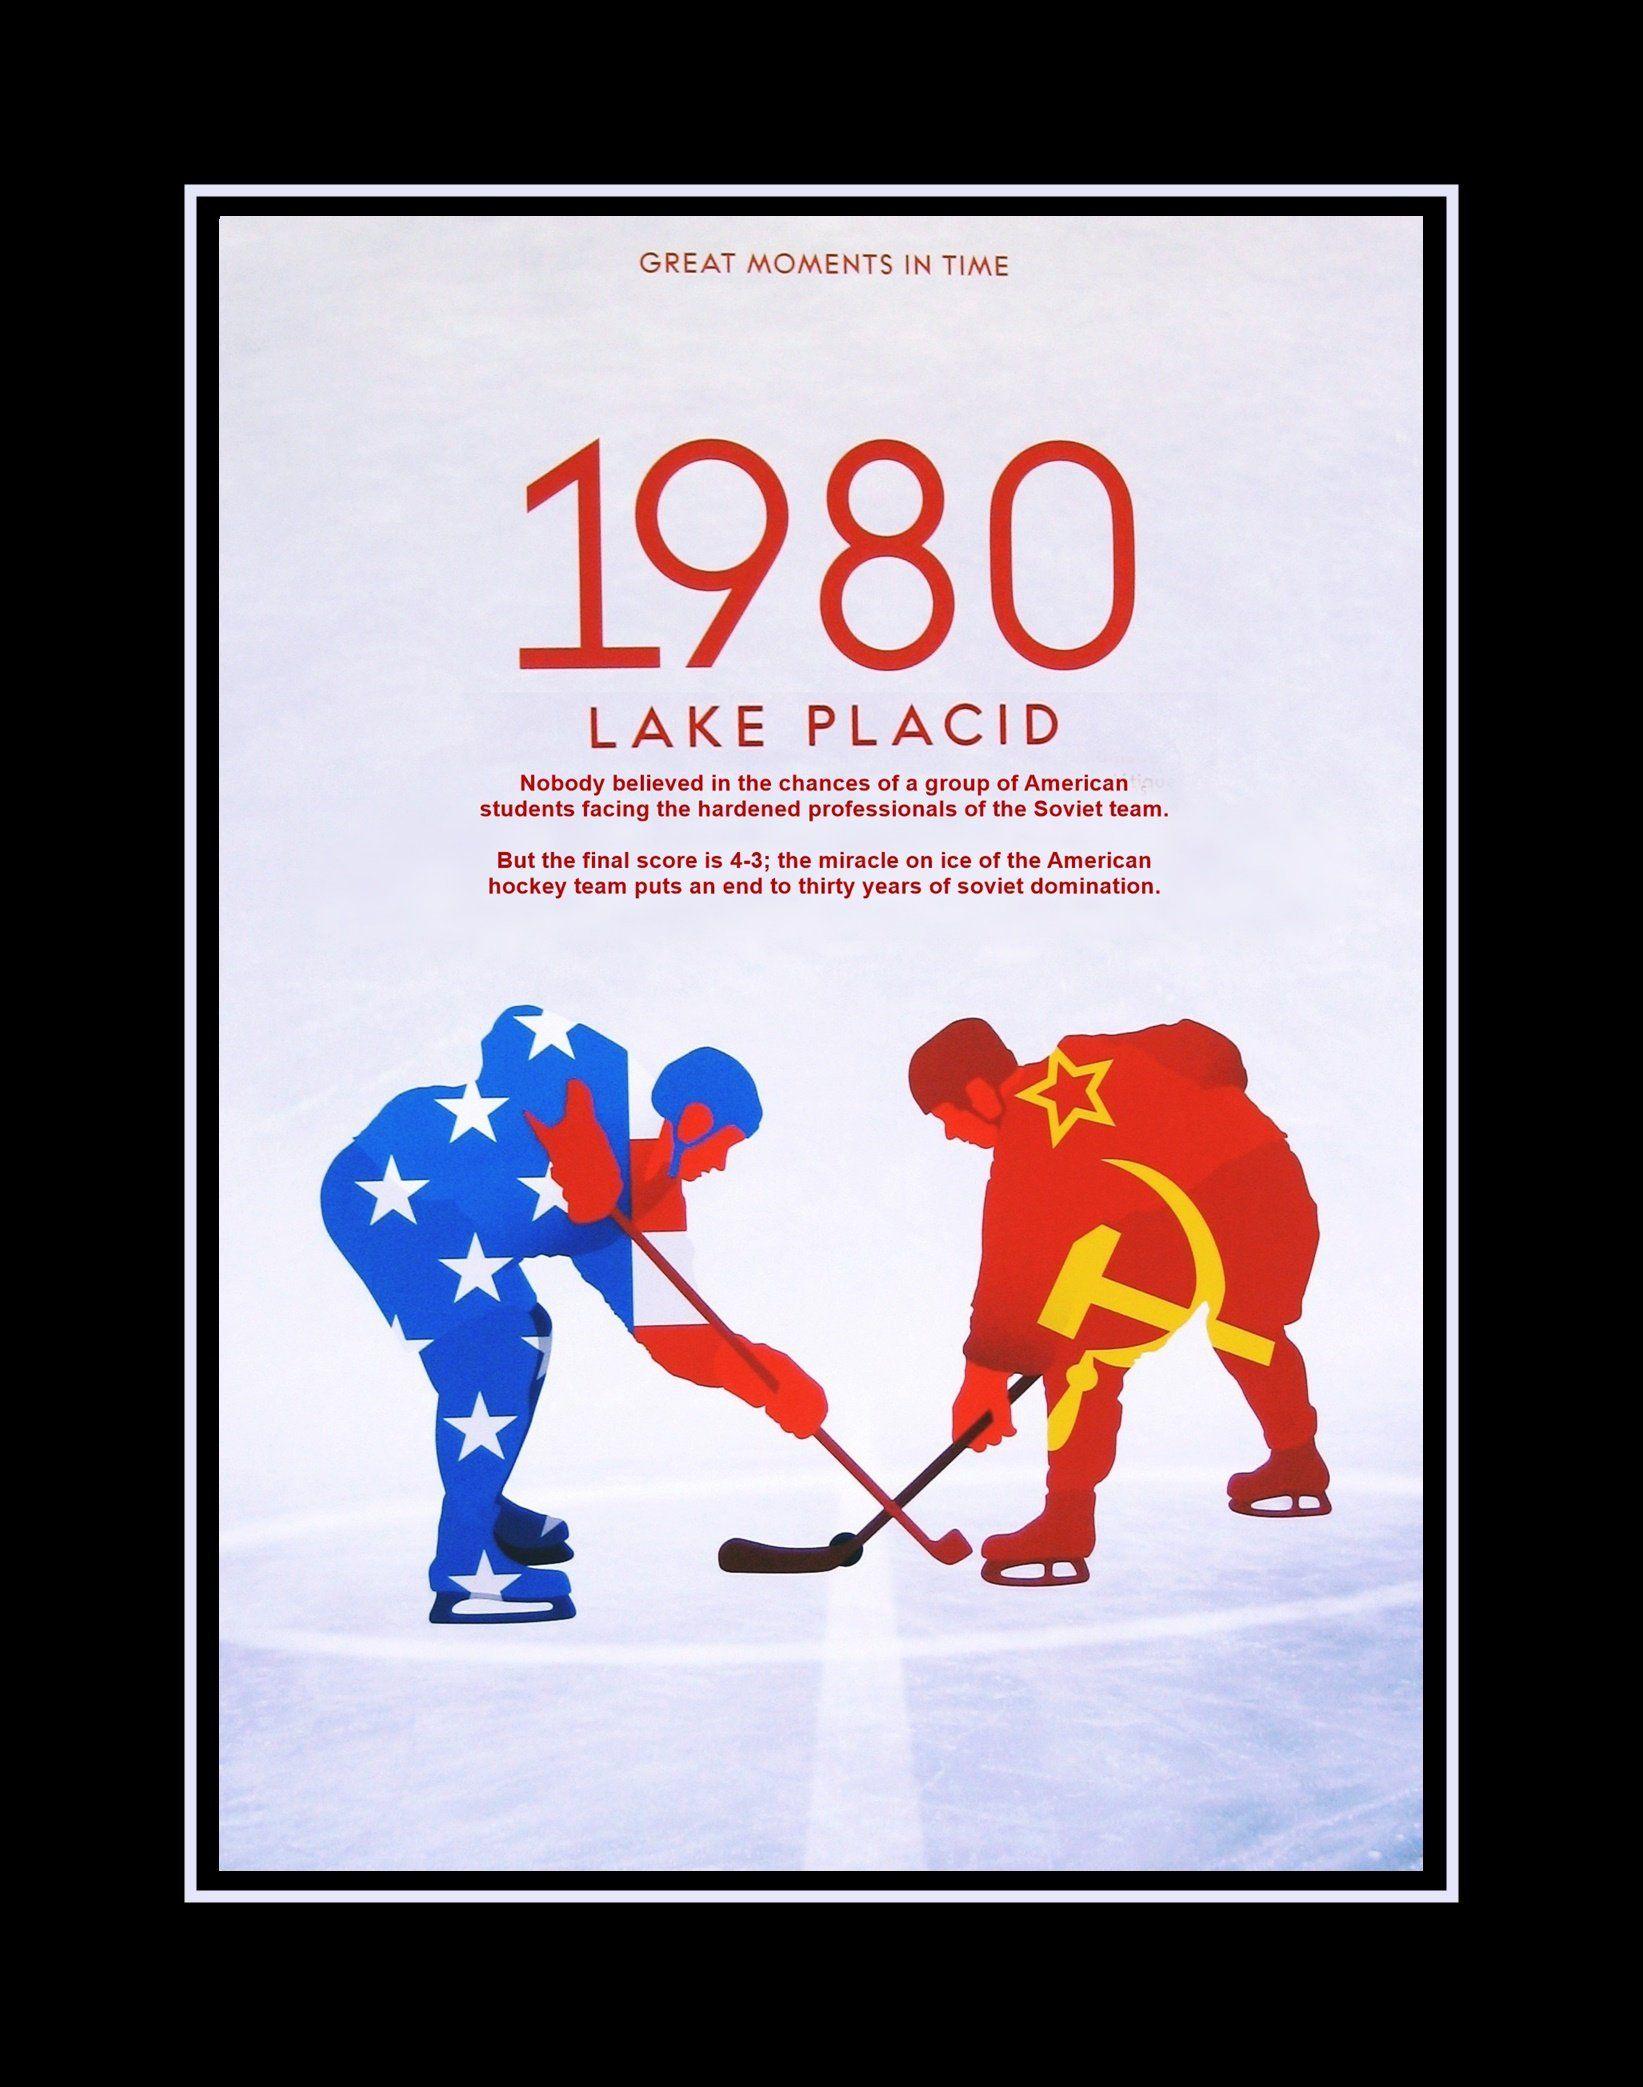 Lake Placid Hockey Wall Art Gift 1980 Olympics Championship Poster Usa Vs Ussr Gift For Him Wall Decor Champion Hockey Wall Art Lake Placid Hockey Posters